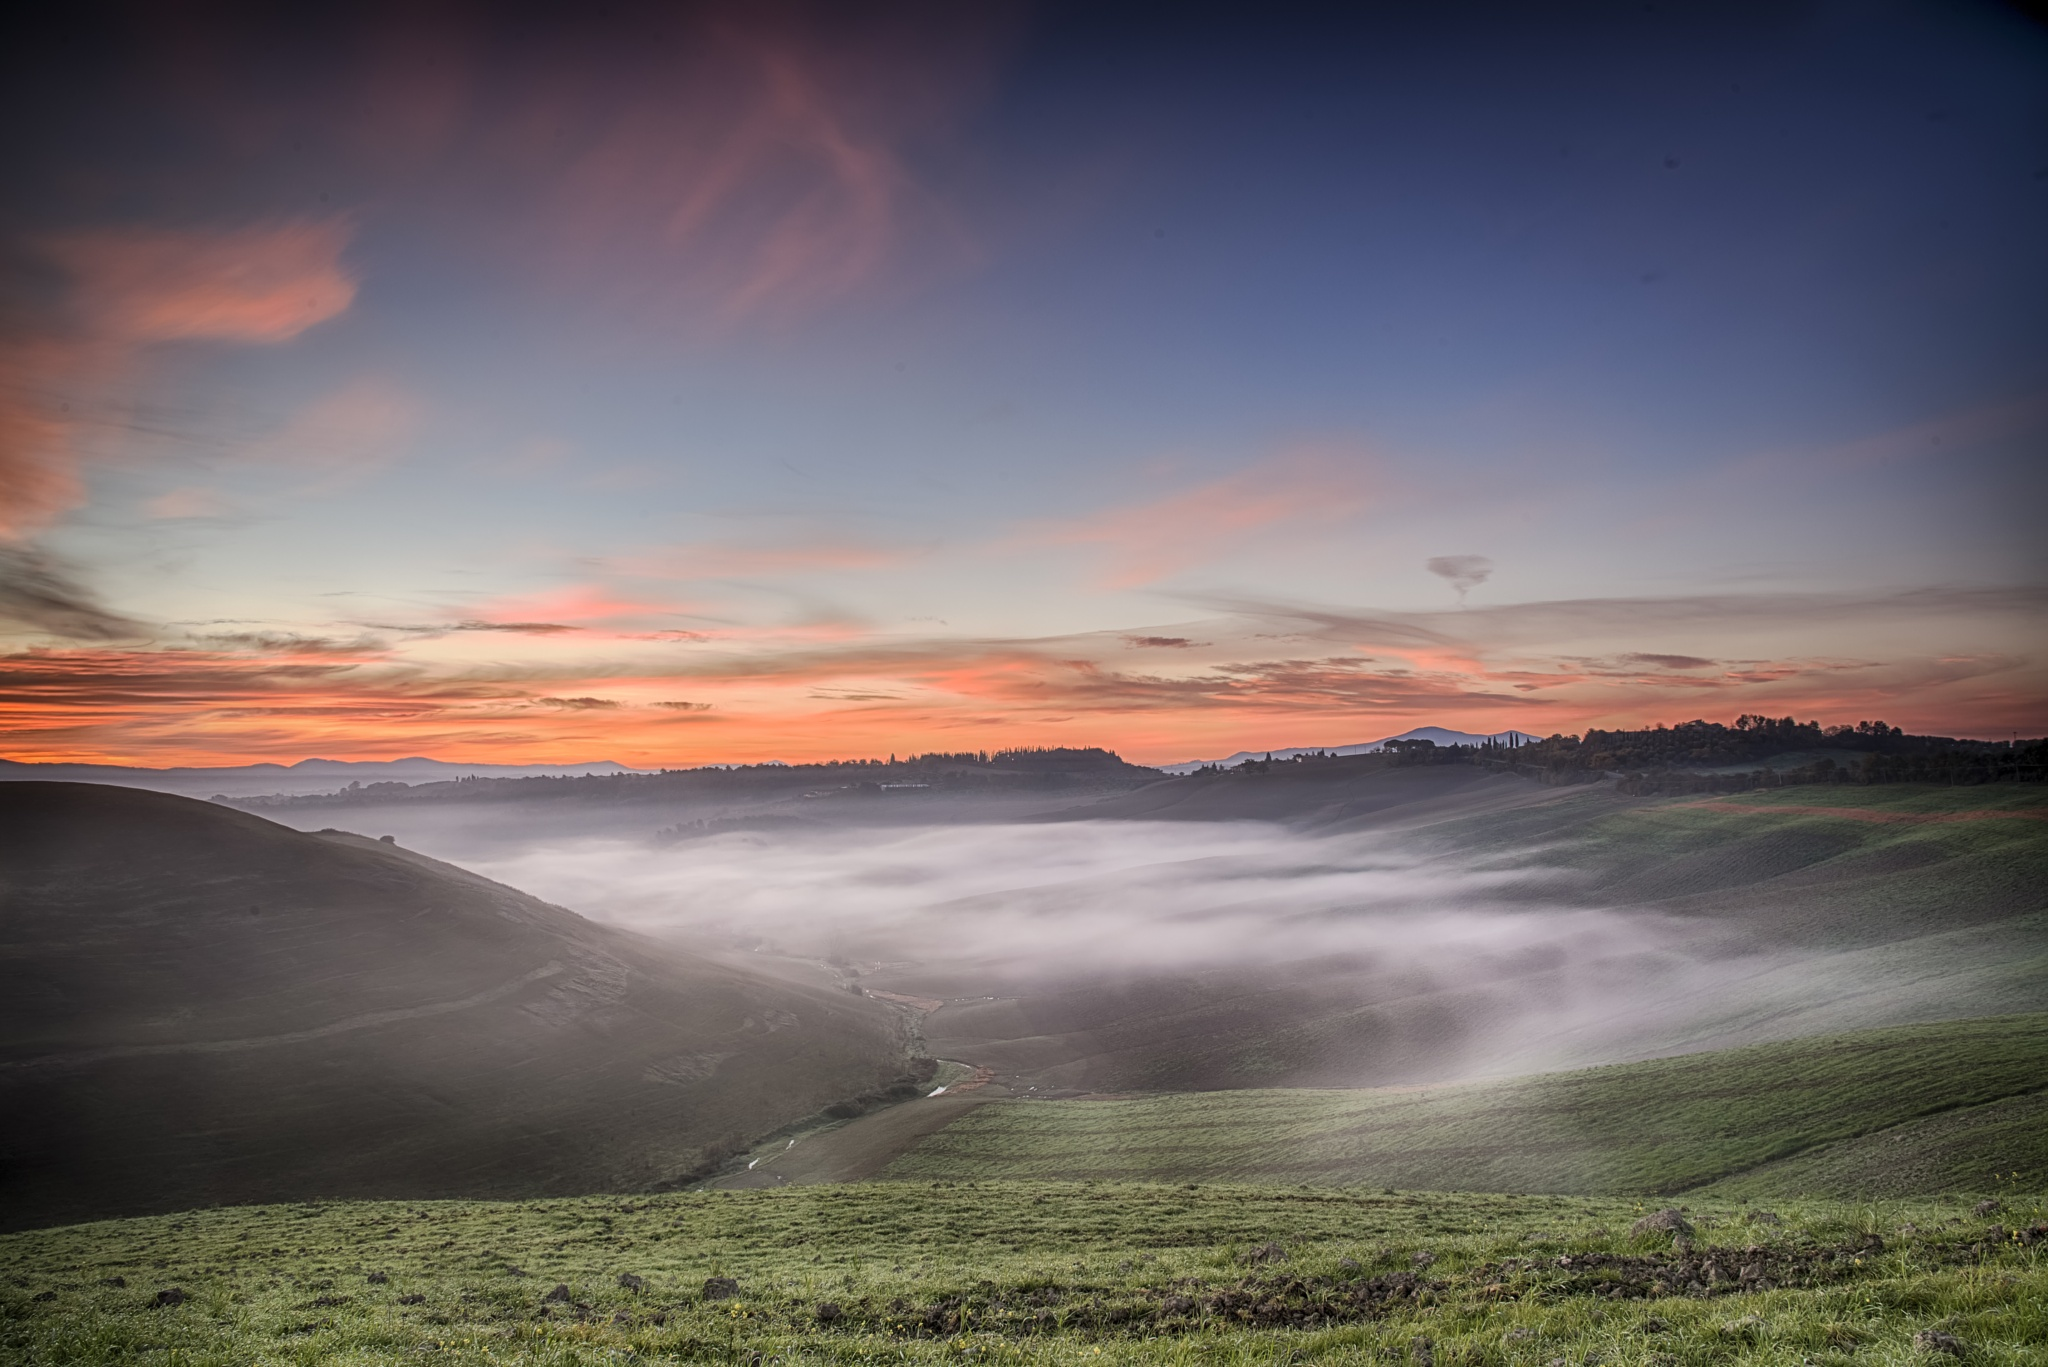 Sunrise by MauMar